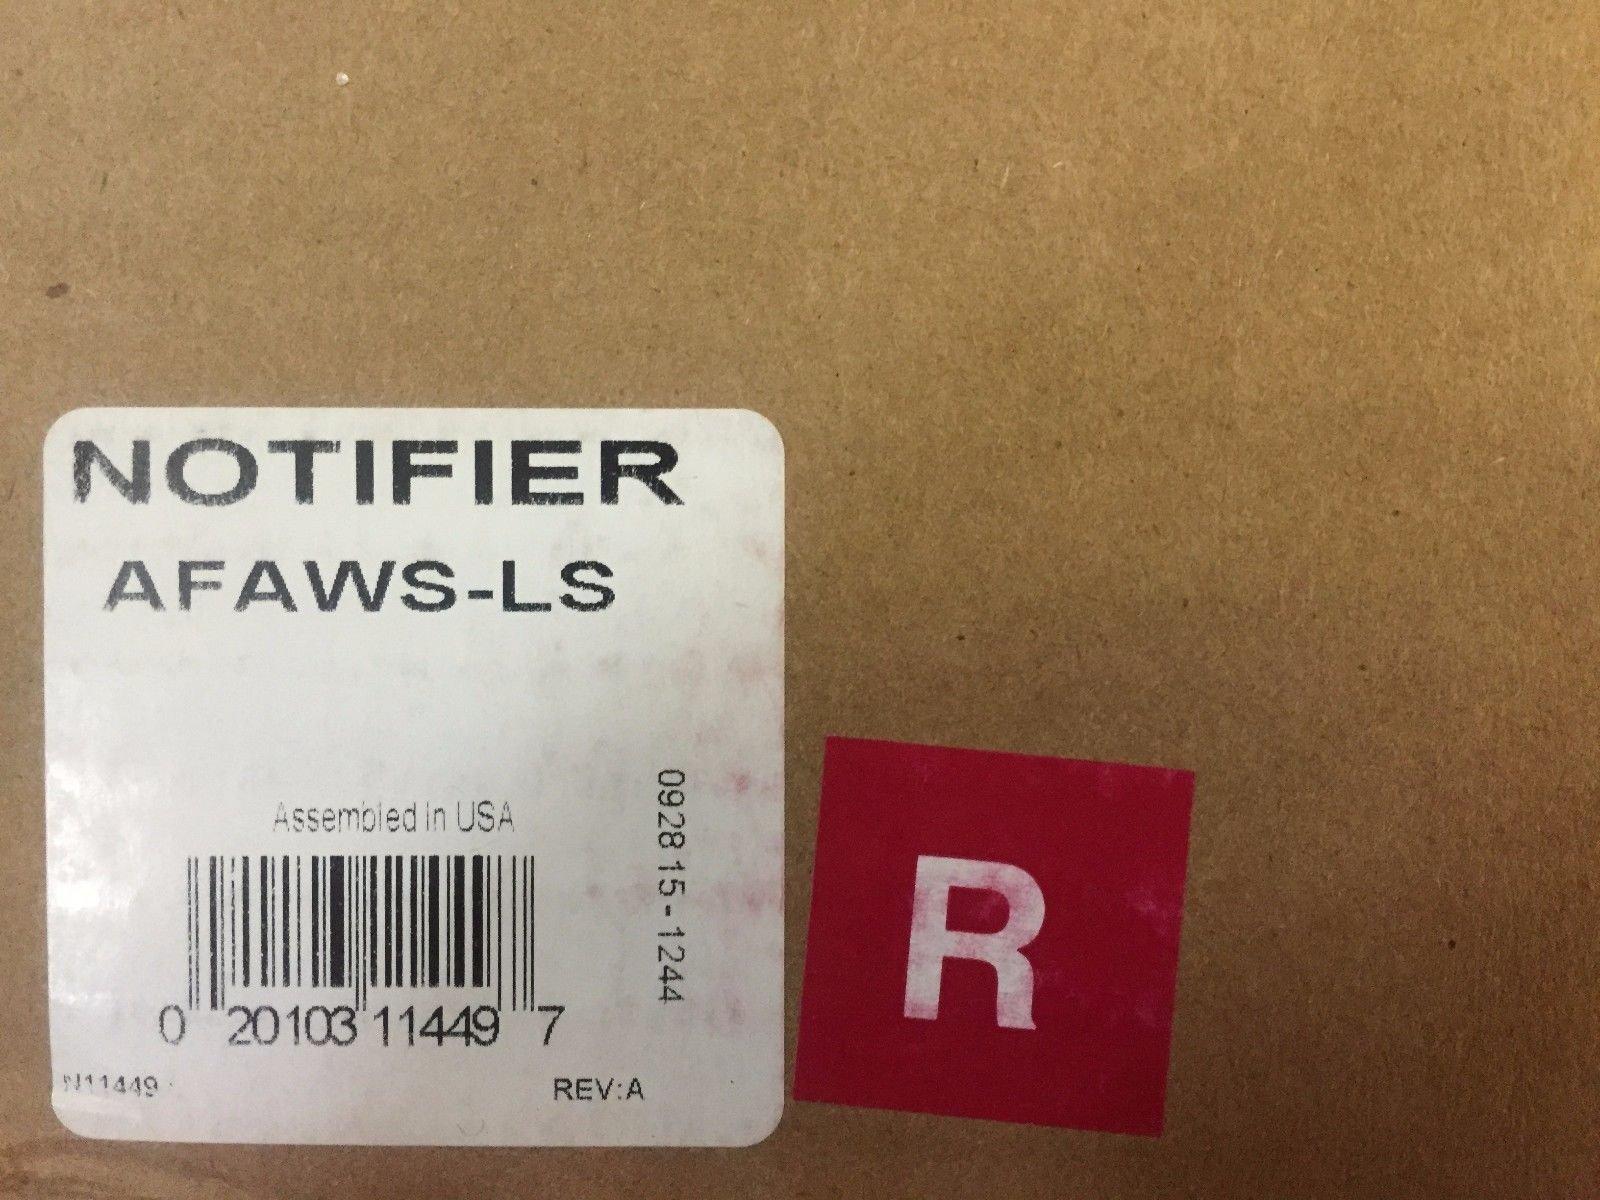 Notifier AFAWS-LS- Door Surface Mount, Latch Style Lock